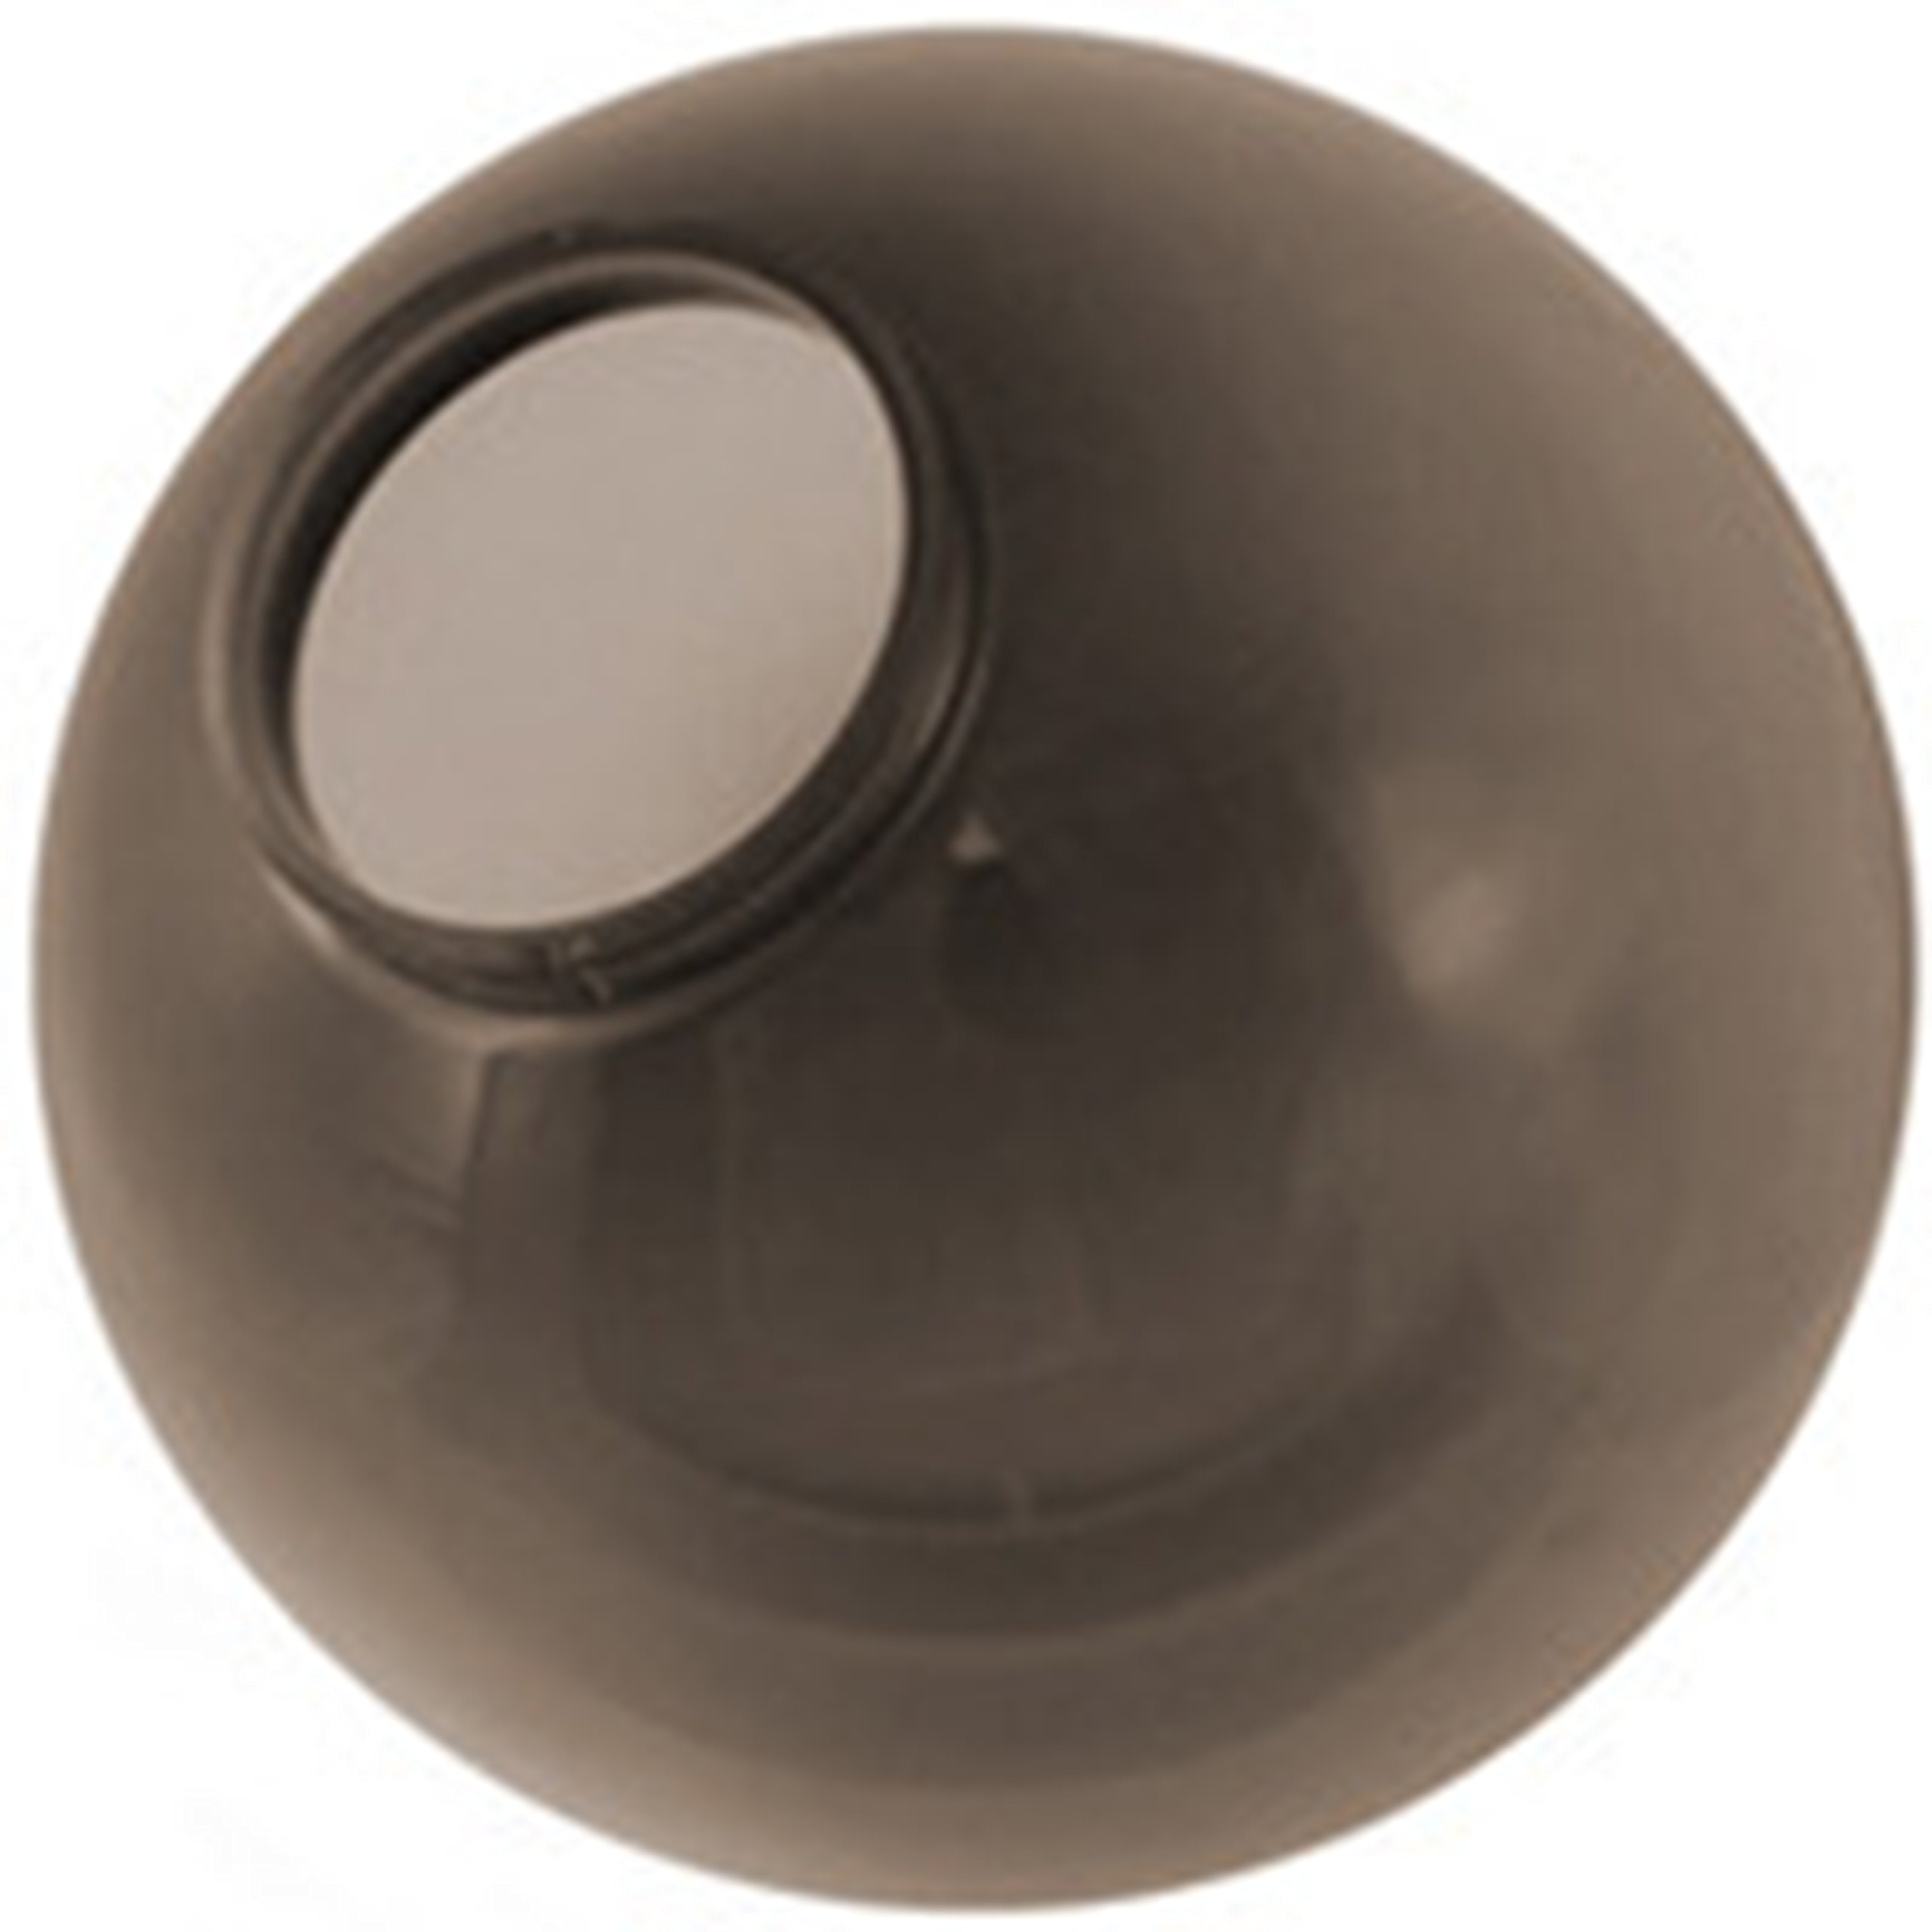 12 Inch Bronze Polycarbonate Lamp Post Globe with 5.7 Inch Twist Lock Neck